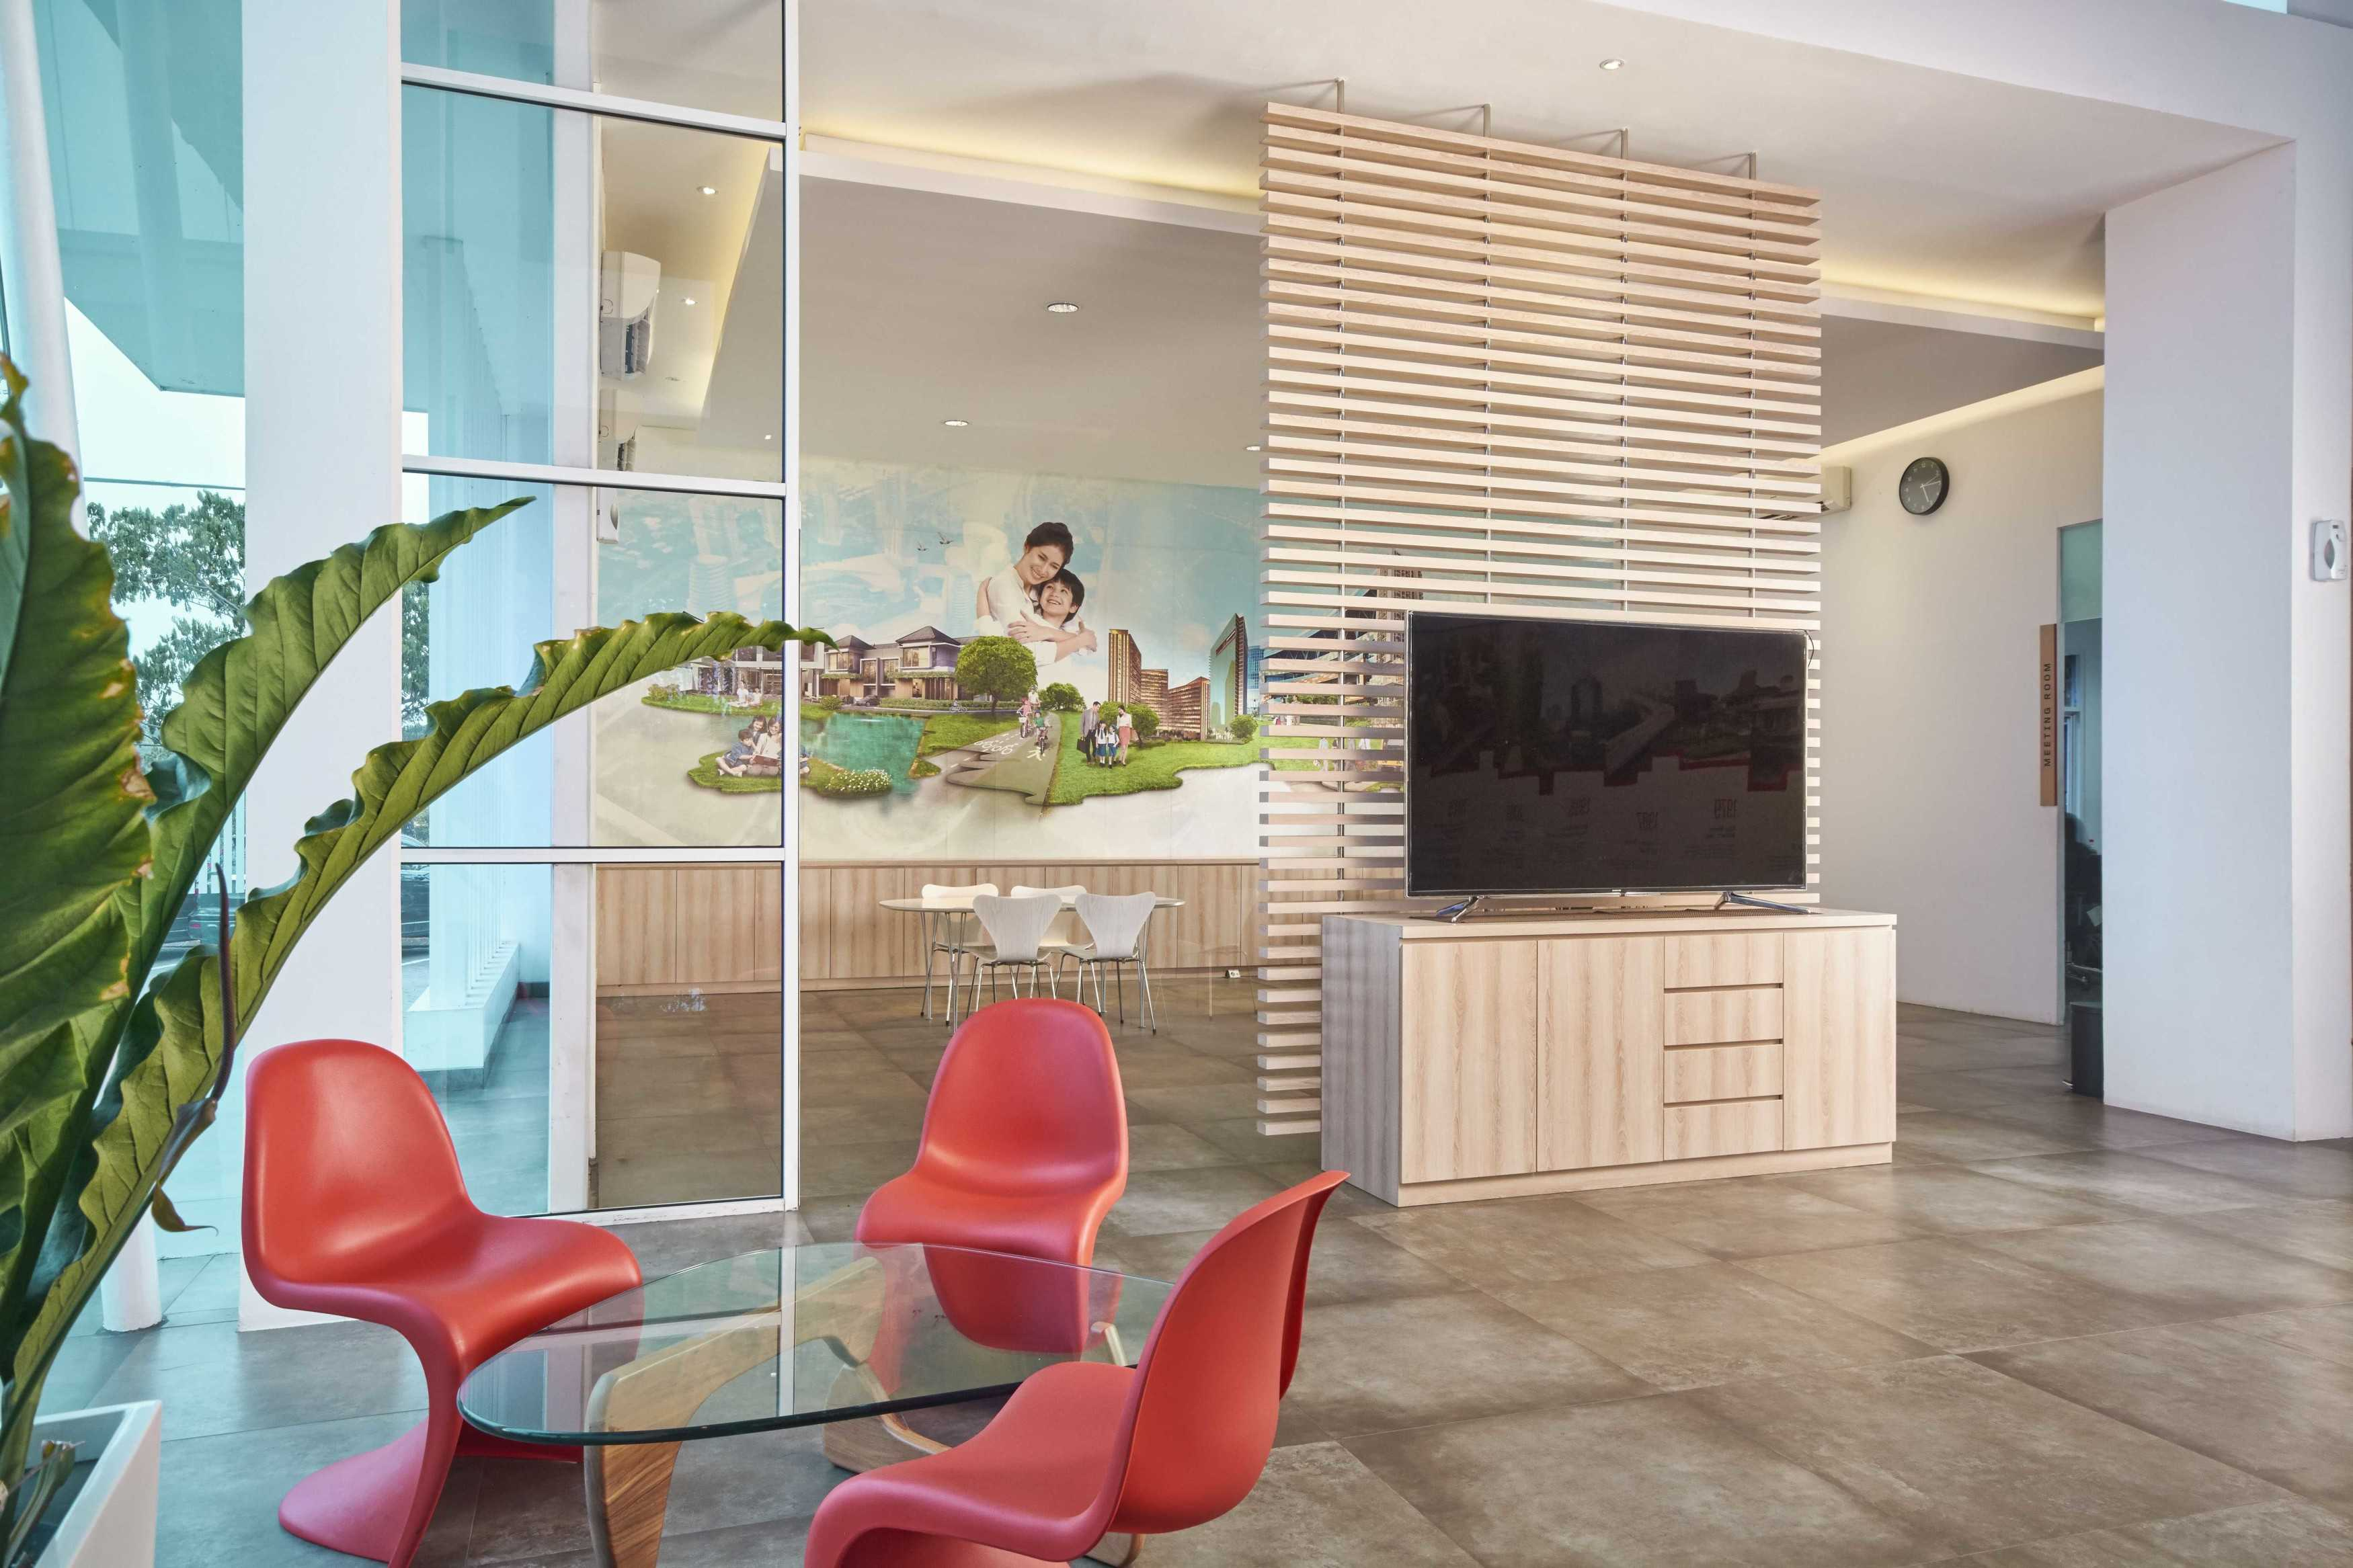 Kotak Design Jaya Real Property Marketing Office Interior Kota Tangerang Selatan, Banten, Indonesia Sinar Mas Land Plaza, Jl. Bsd Green Boulevard Barat Kav. Office Park No. 1, Sampora, Tangerang, Banten 15157, Indonesia Seating Area Modern  45447